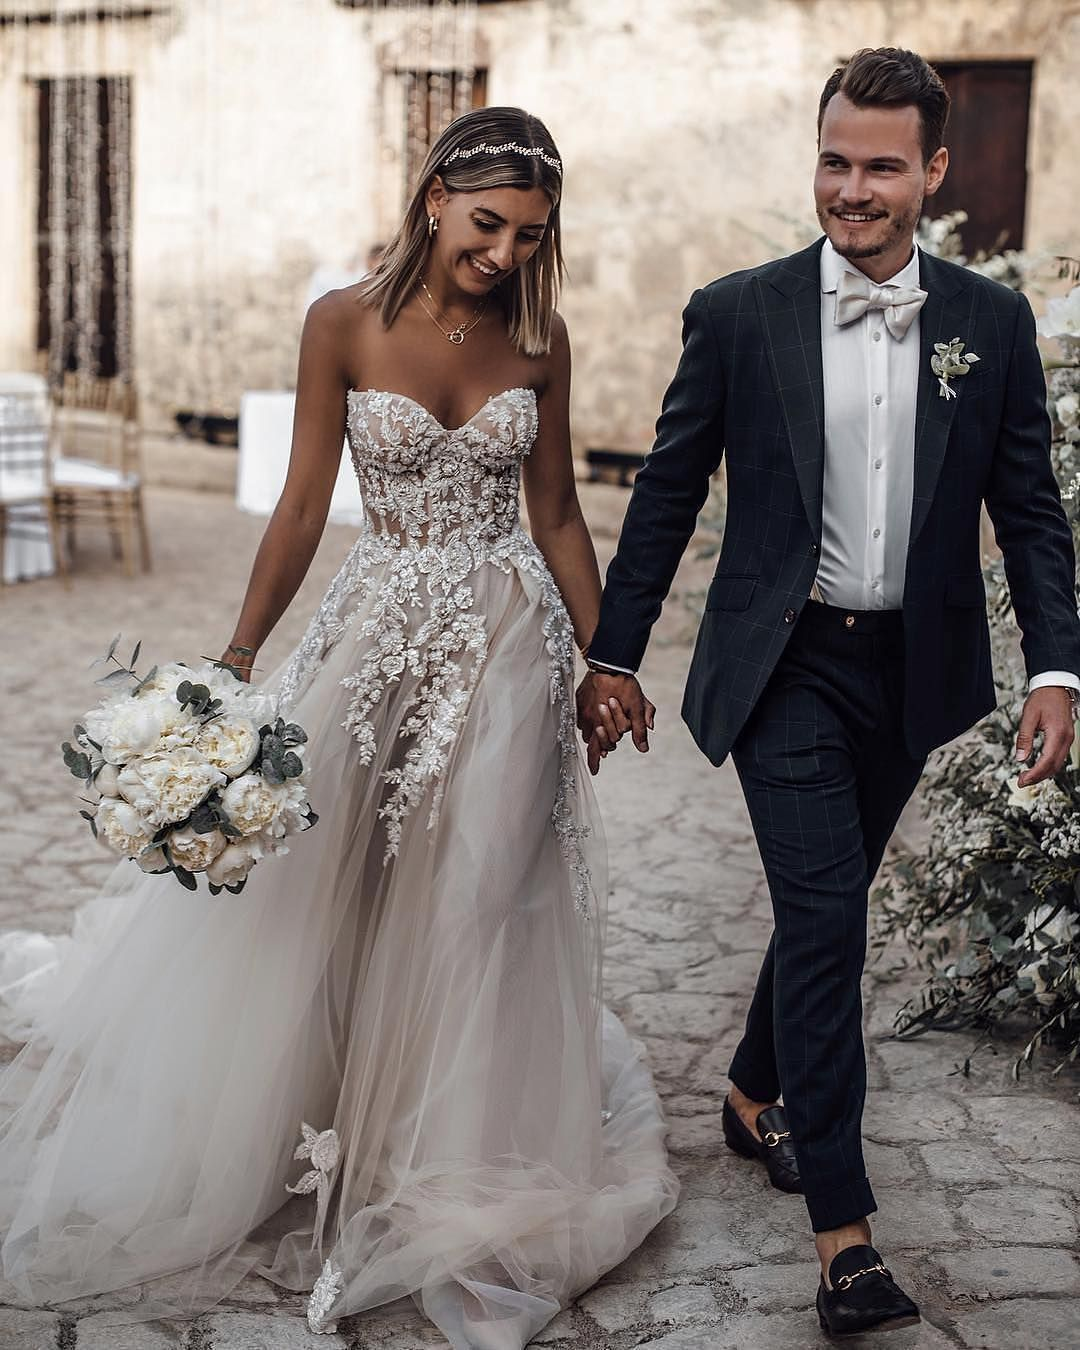 Jeanne Love Royal Sweetheart A Line Wedding Dresses 2019: A-line Sweetheart Long White Tulle Wedding Dress · Modsele